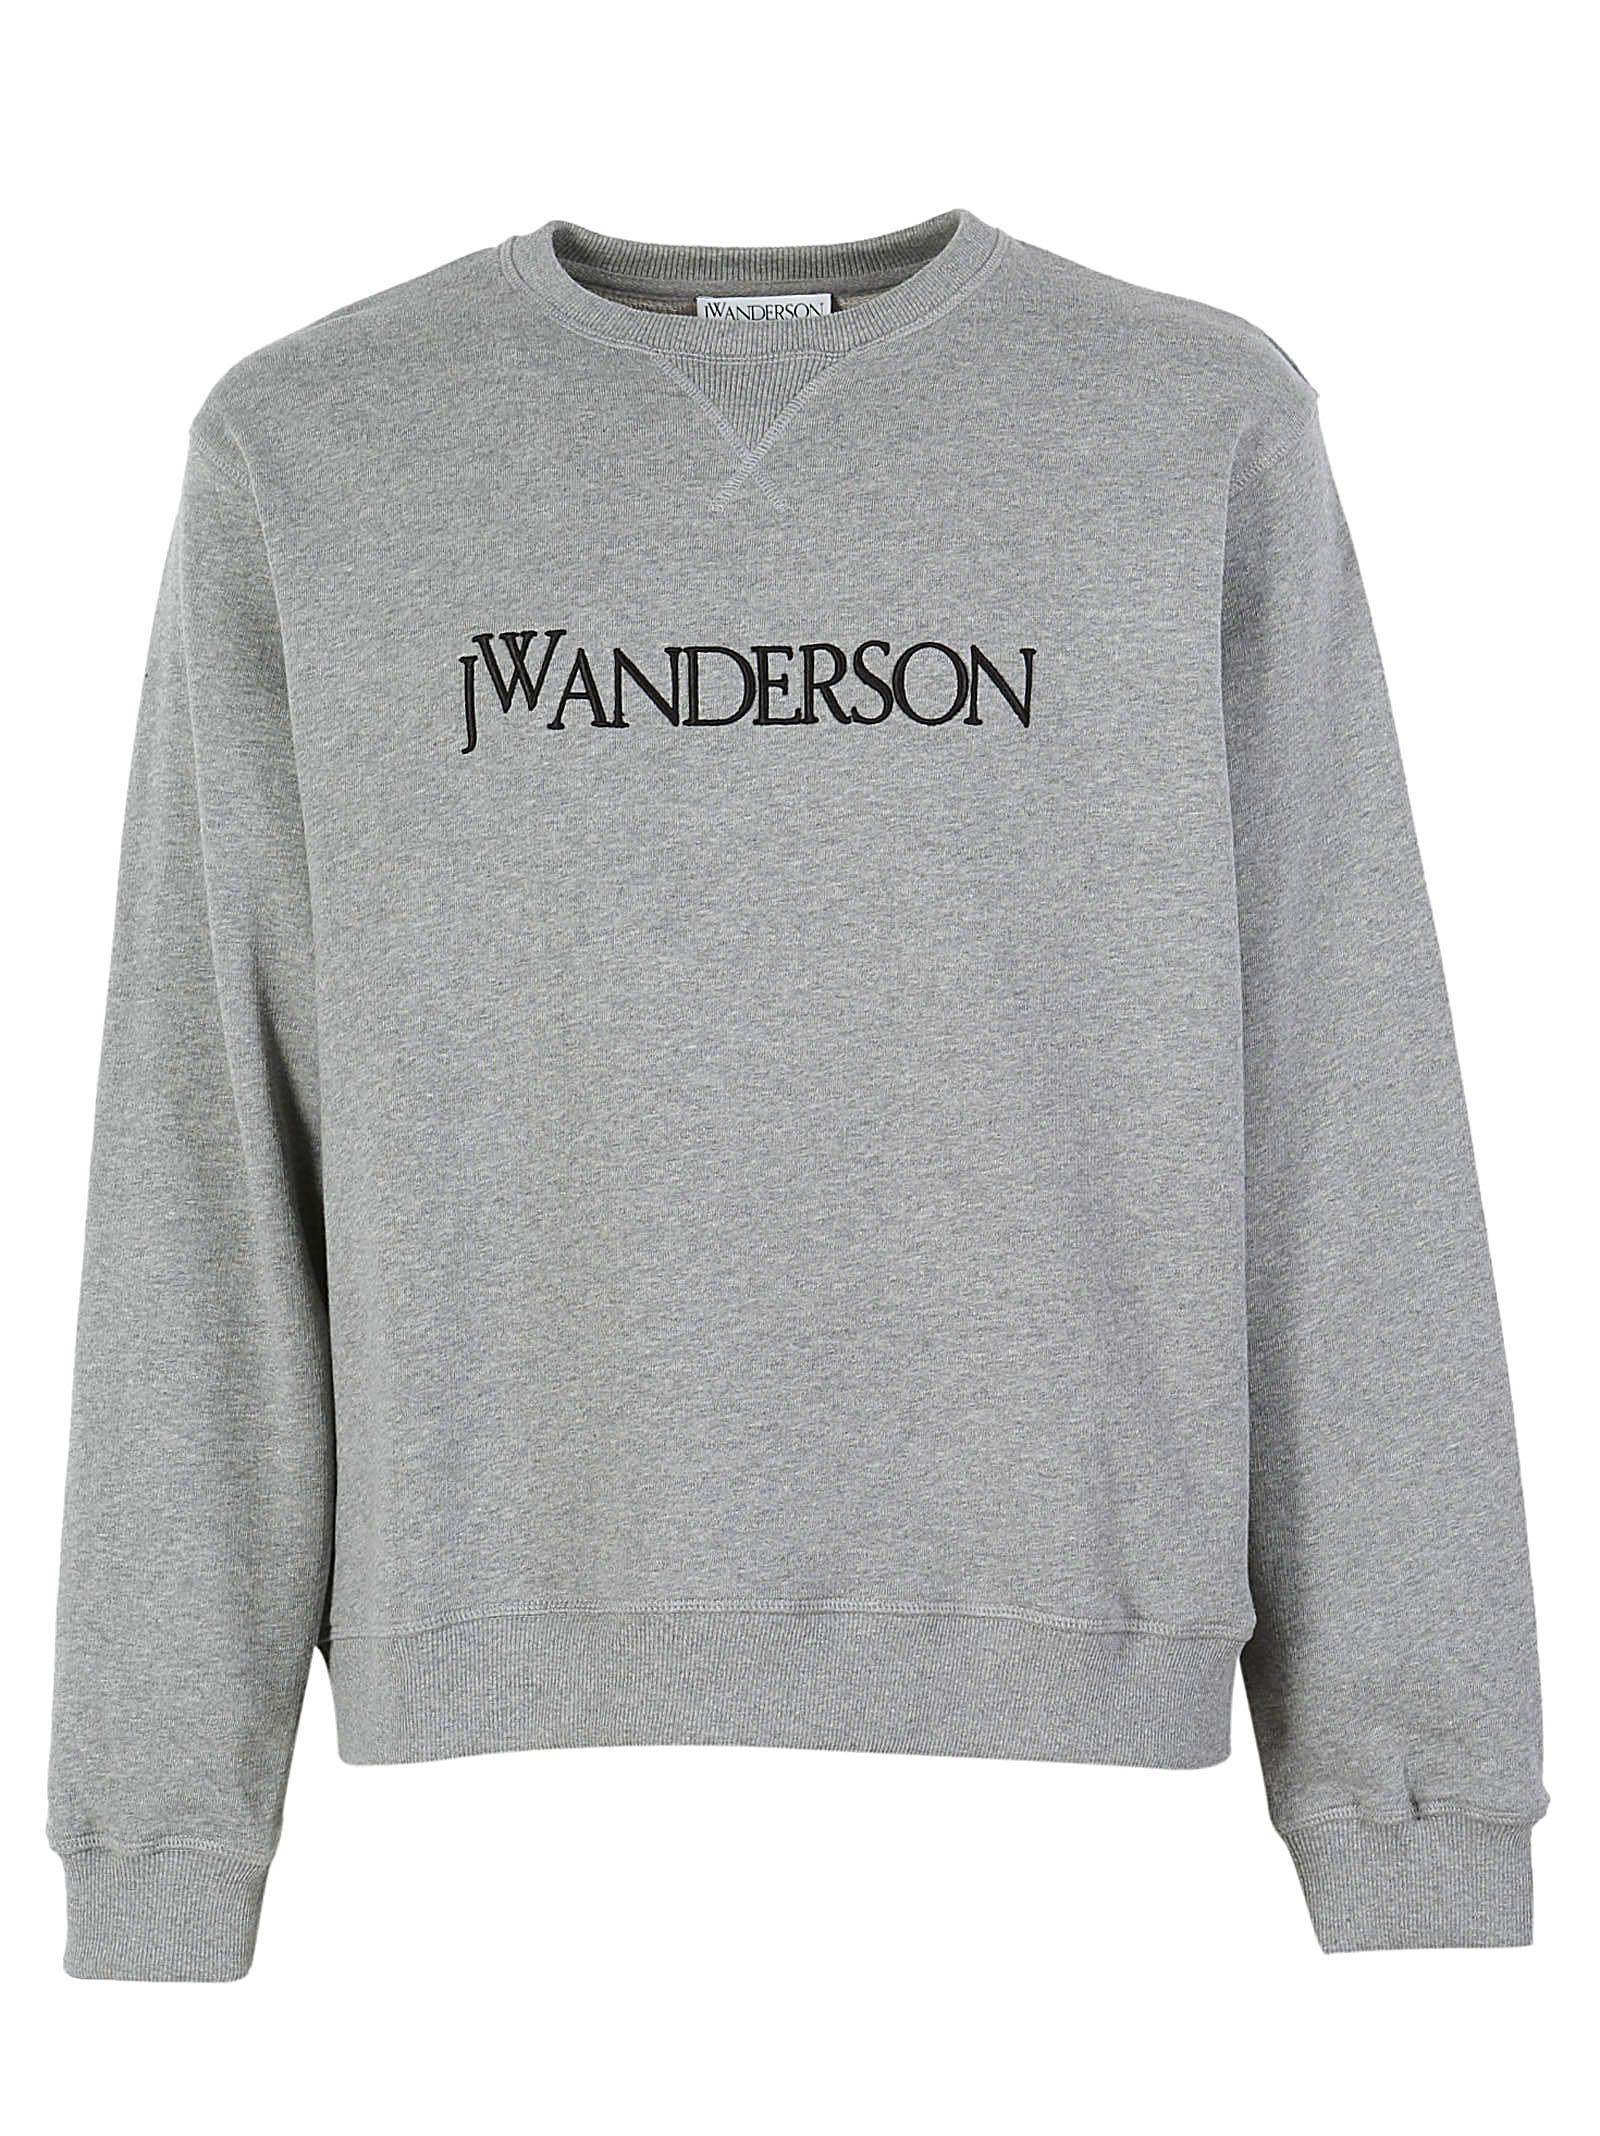 TOPWEAR - Sweatshirts J.W.Anderson Choice Cheap Online Cheap Sale Wiki BGN8Gq